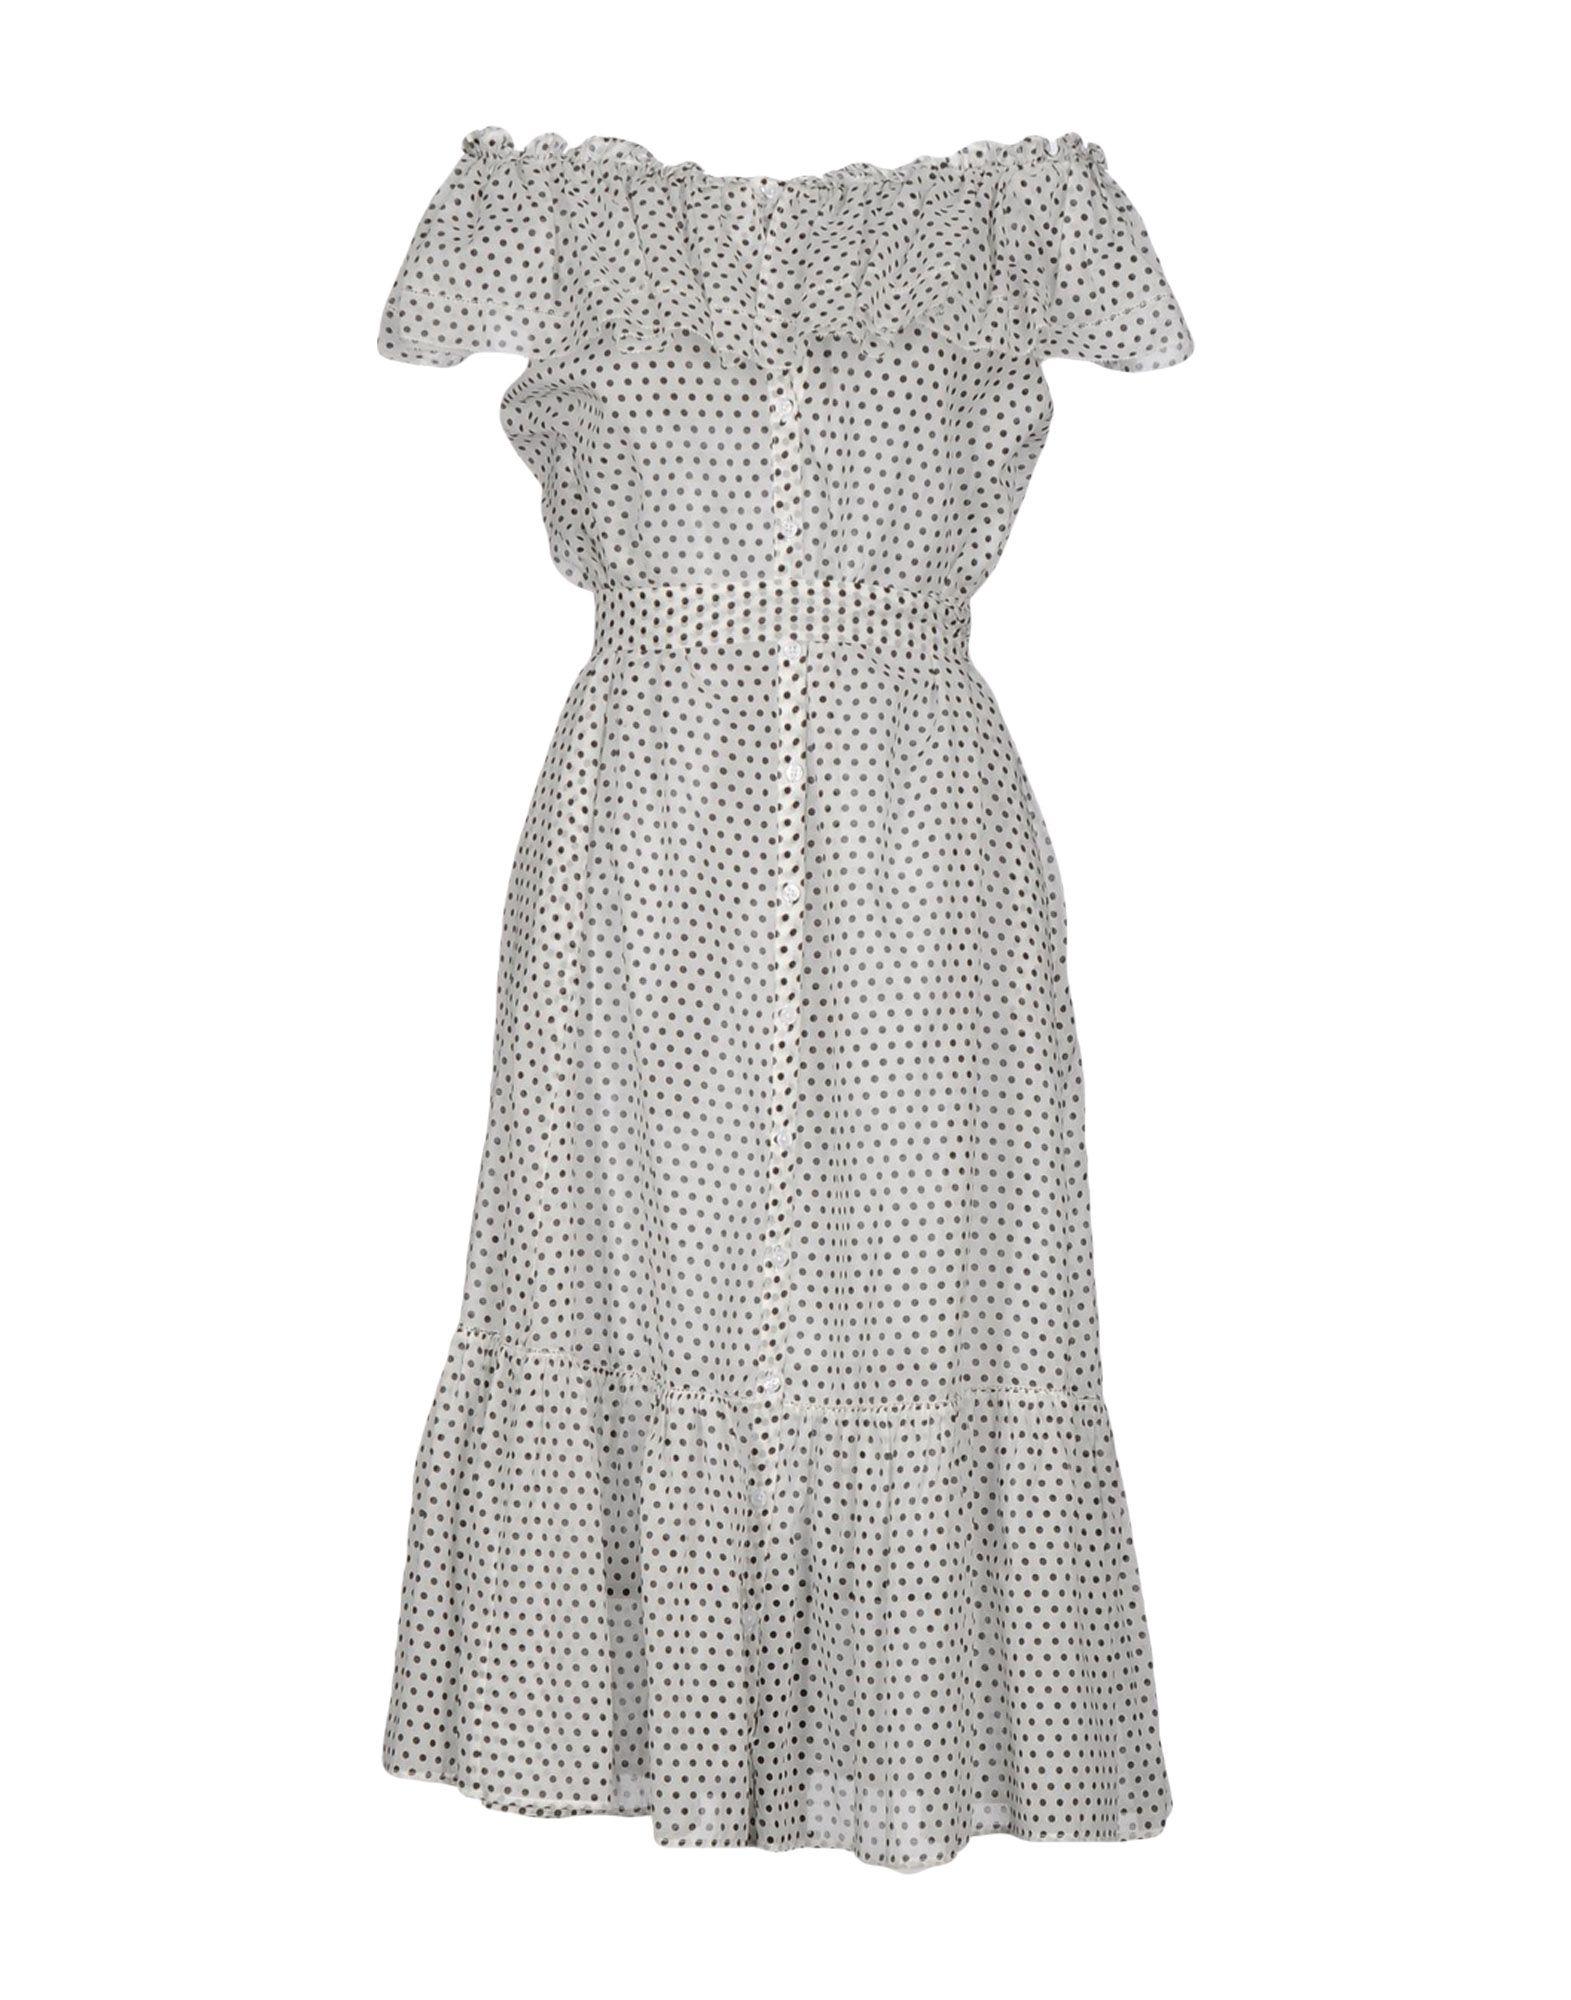 LISA MARIE FERNANDEZ Платье длиной 3/4 lisa corti платье длиной 3 4